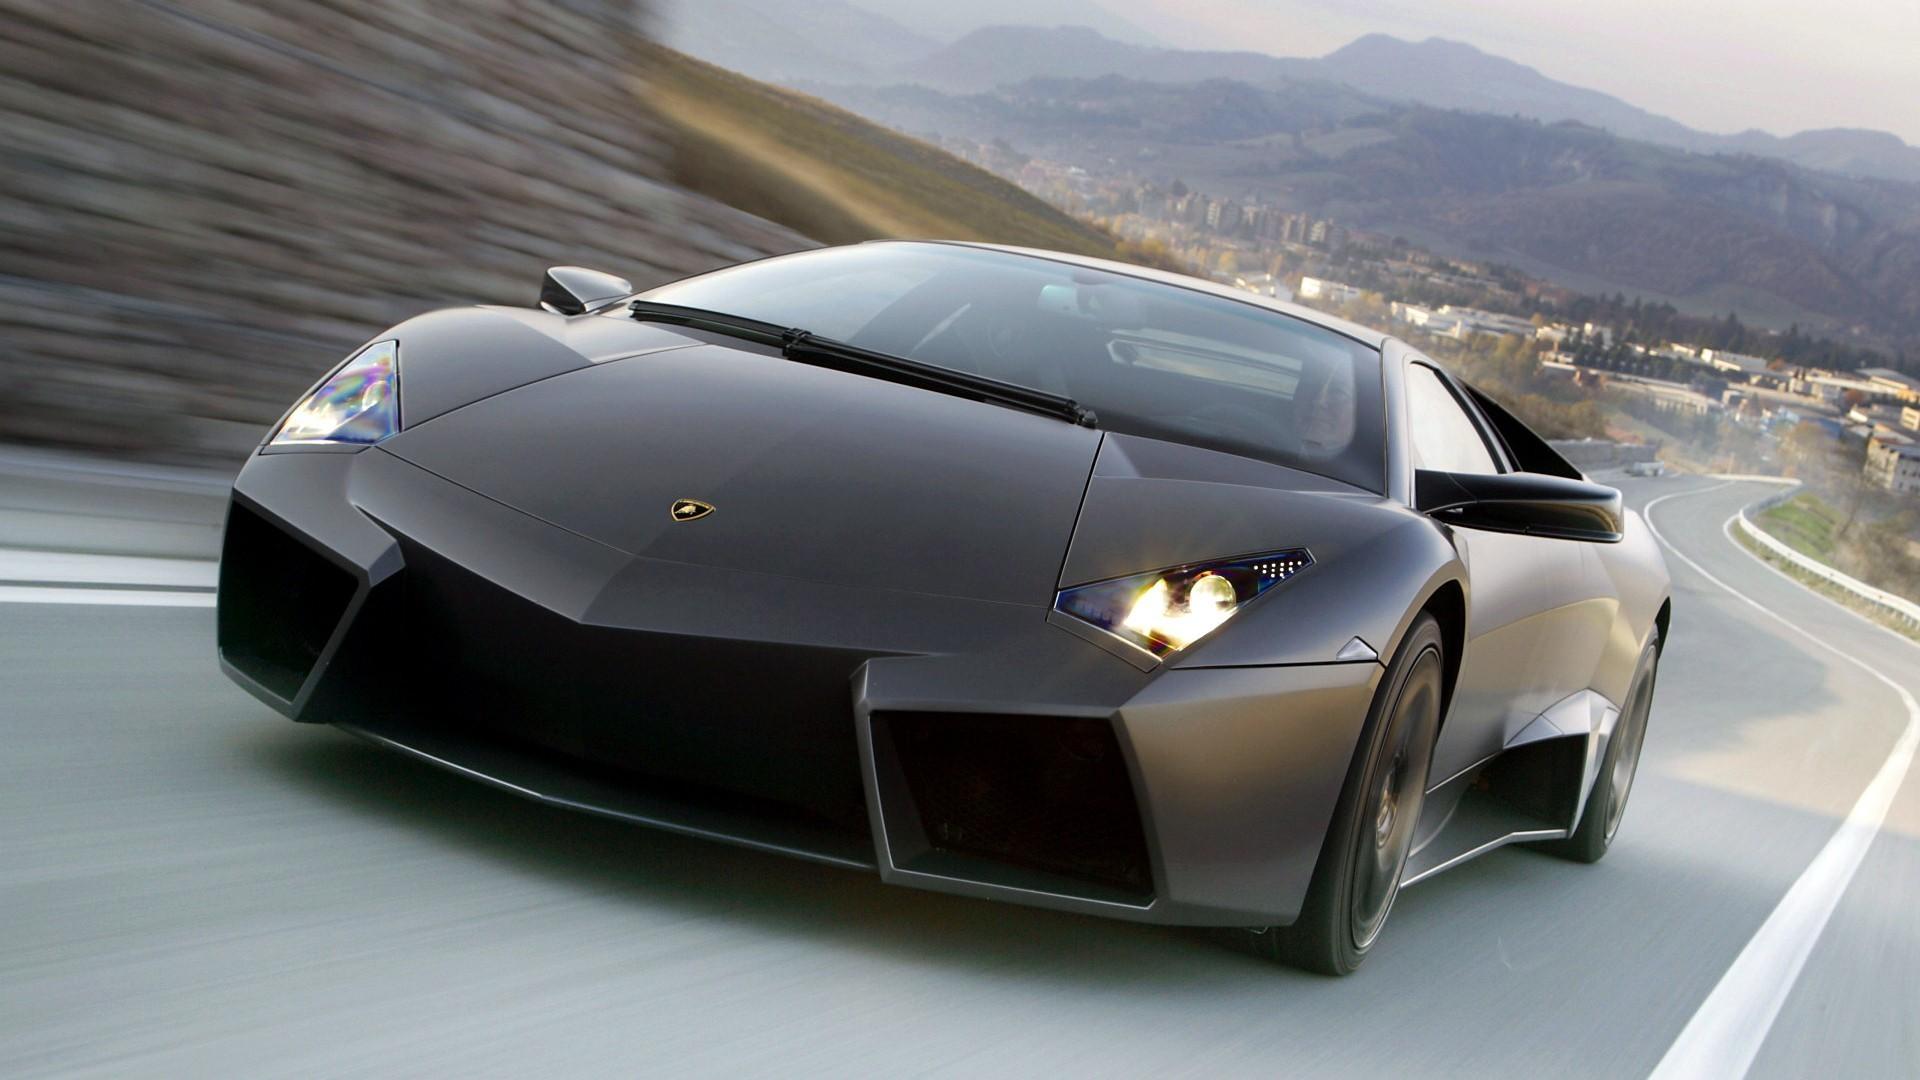 Wallpaper 1920x1080 Px Lamborghini Reventon 1920x1080 Wallhaven